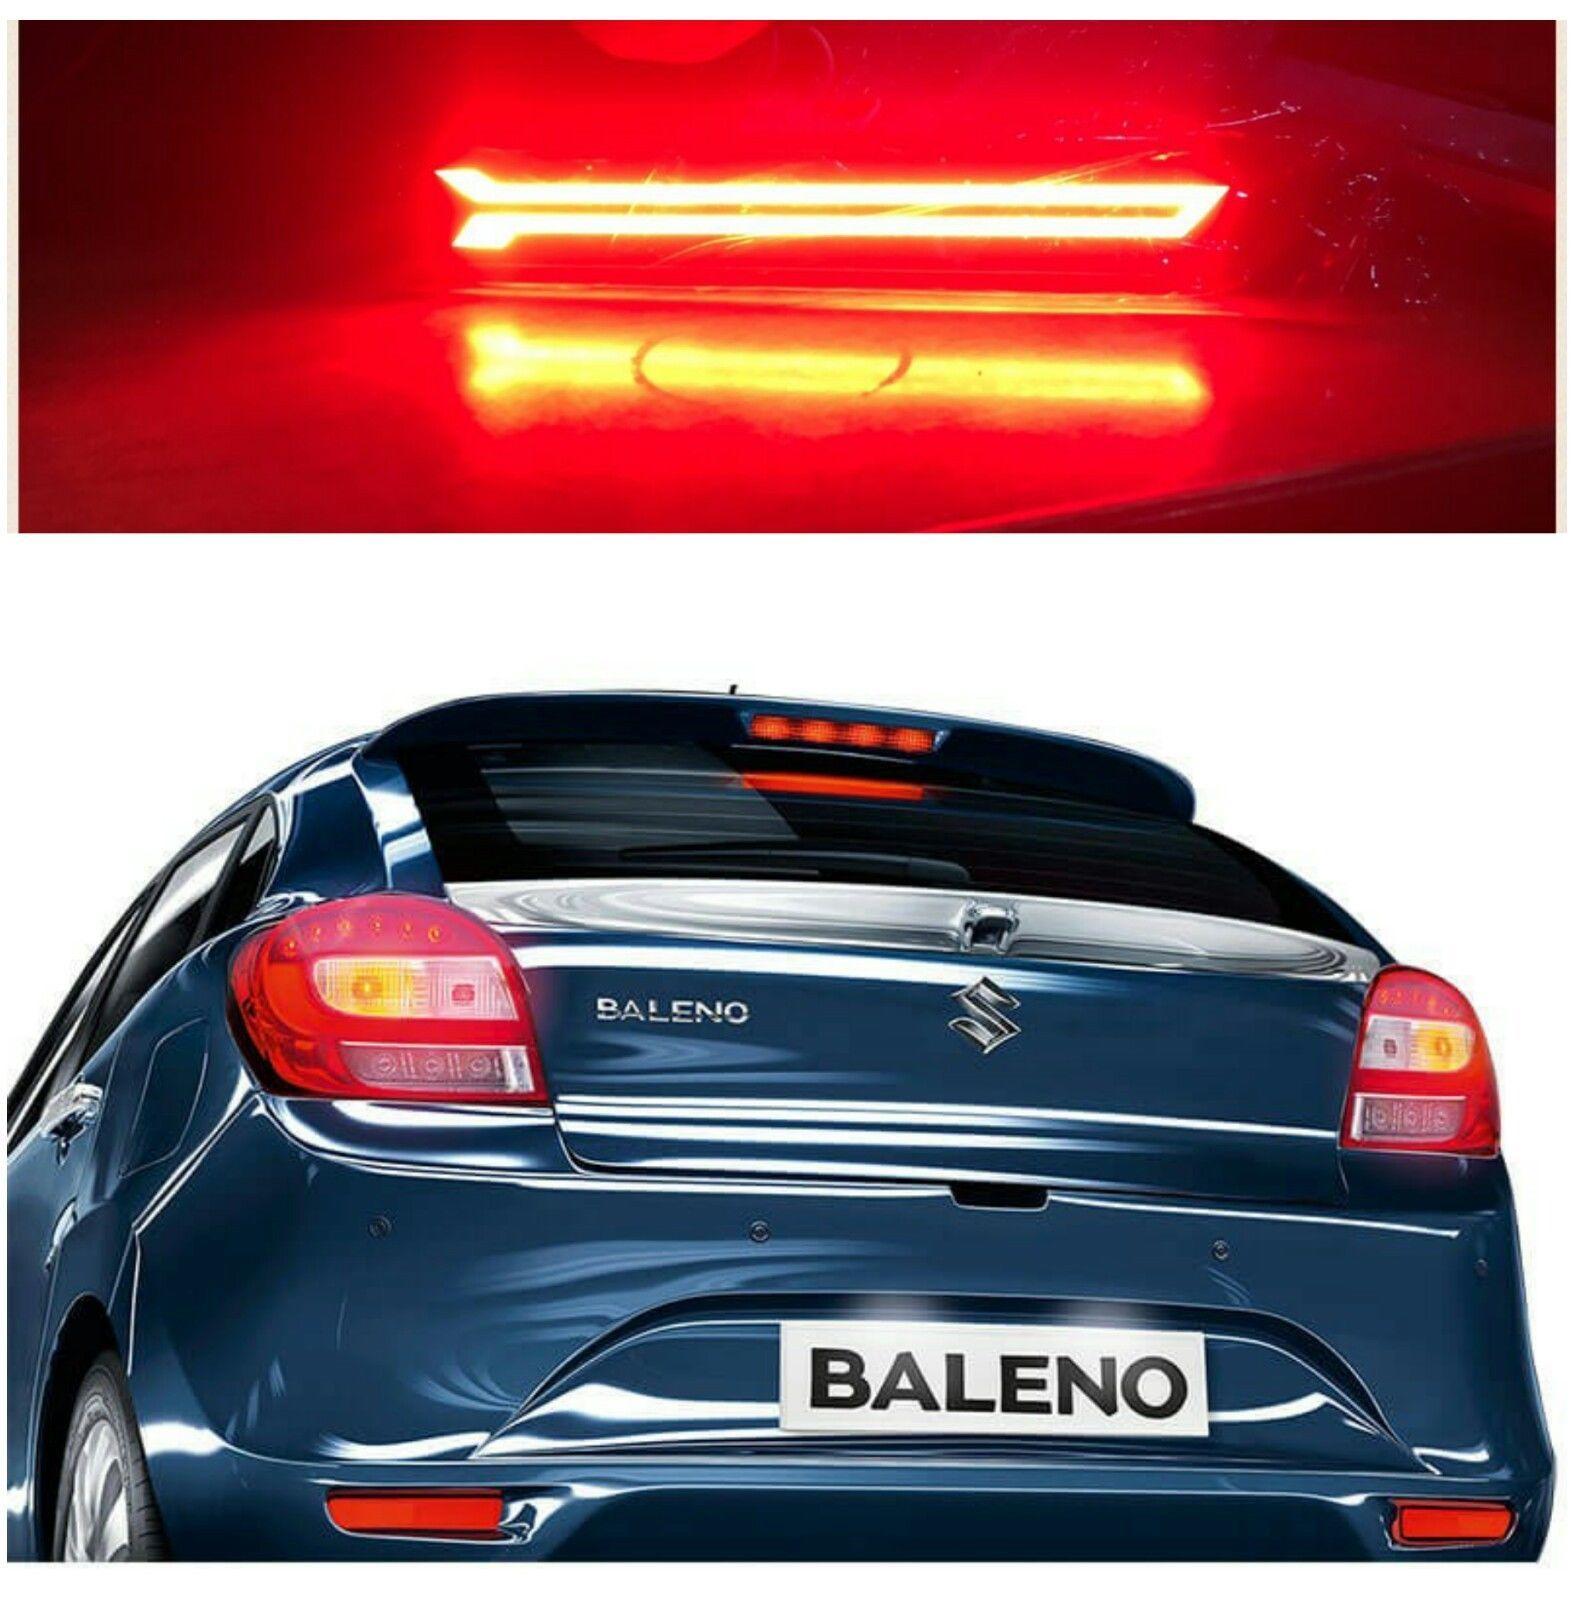 ae100a85d04890db86c1f86fffe84ae6 Outstanding Bugatti Veyron Price In Kolkata Cars Trend